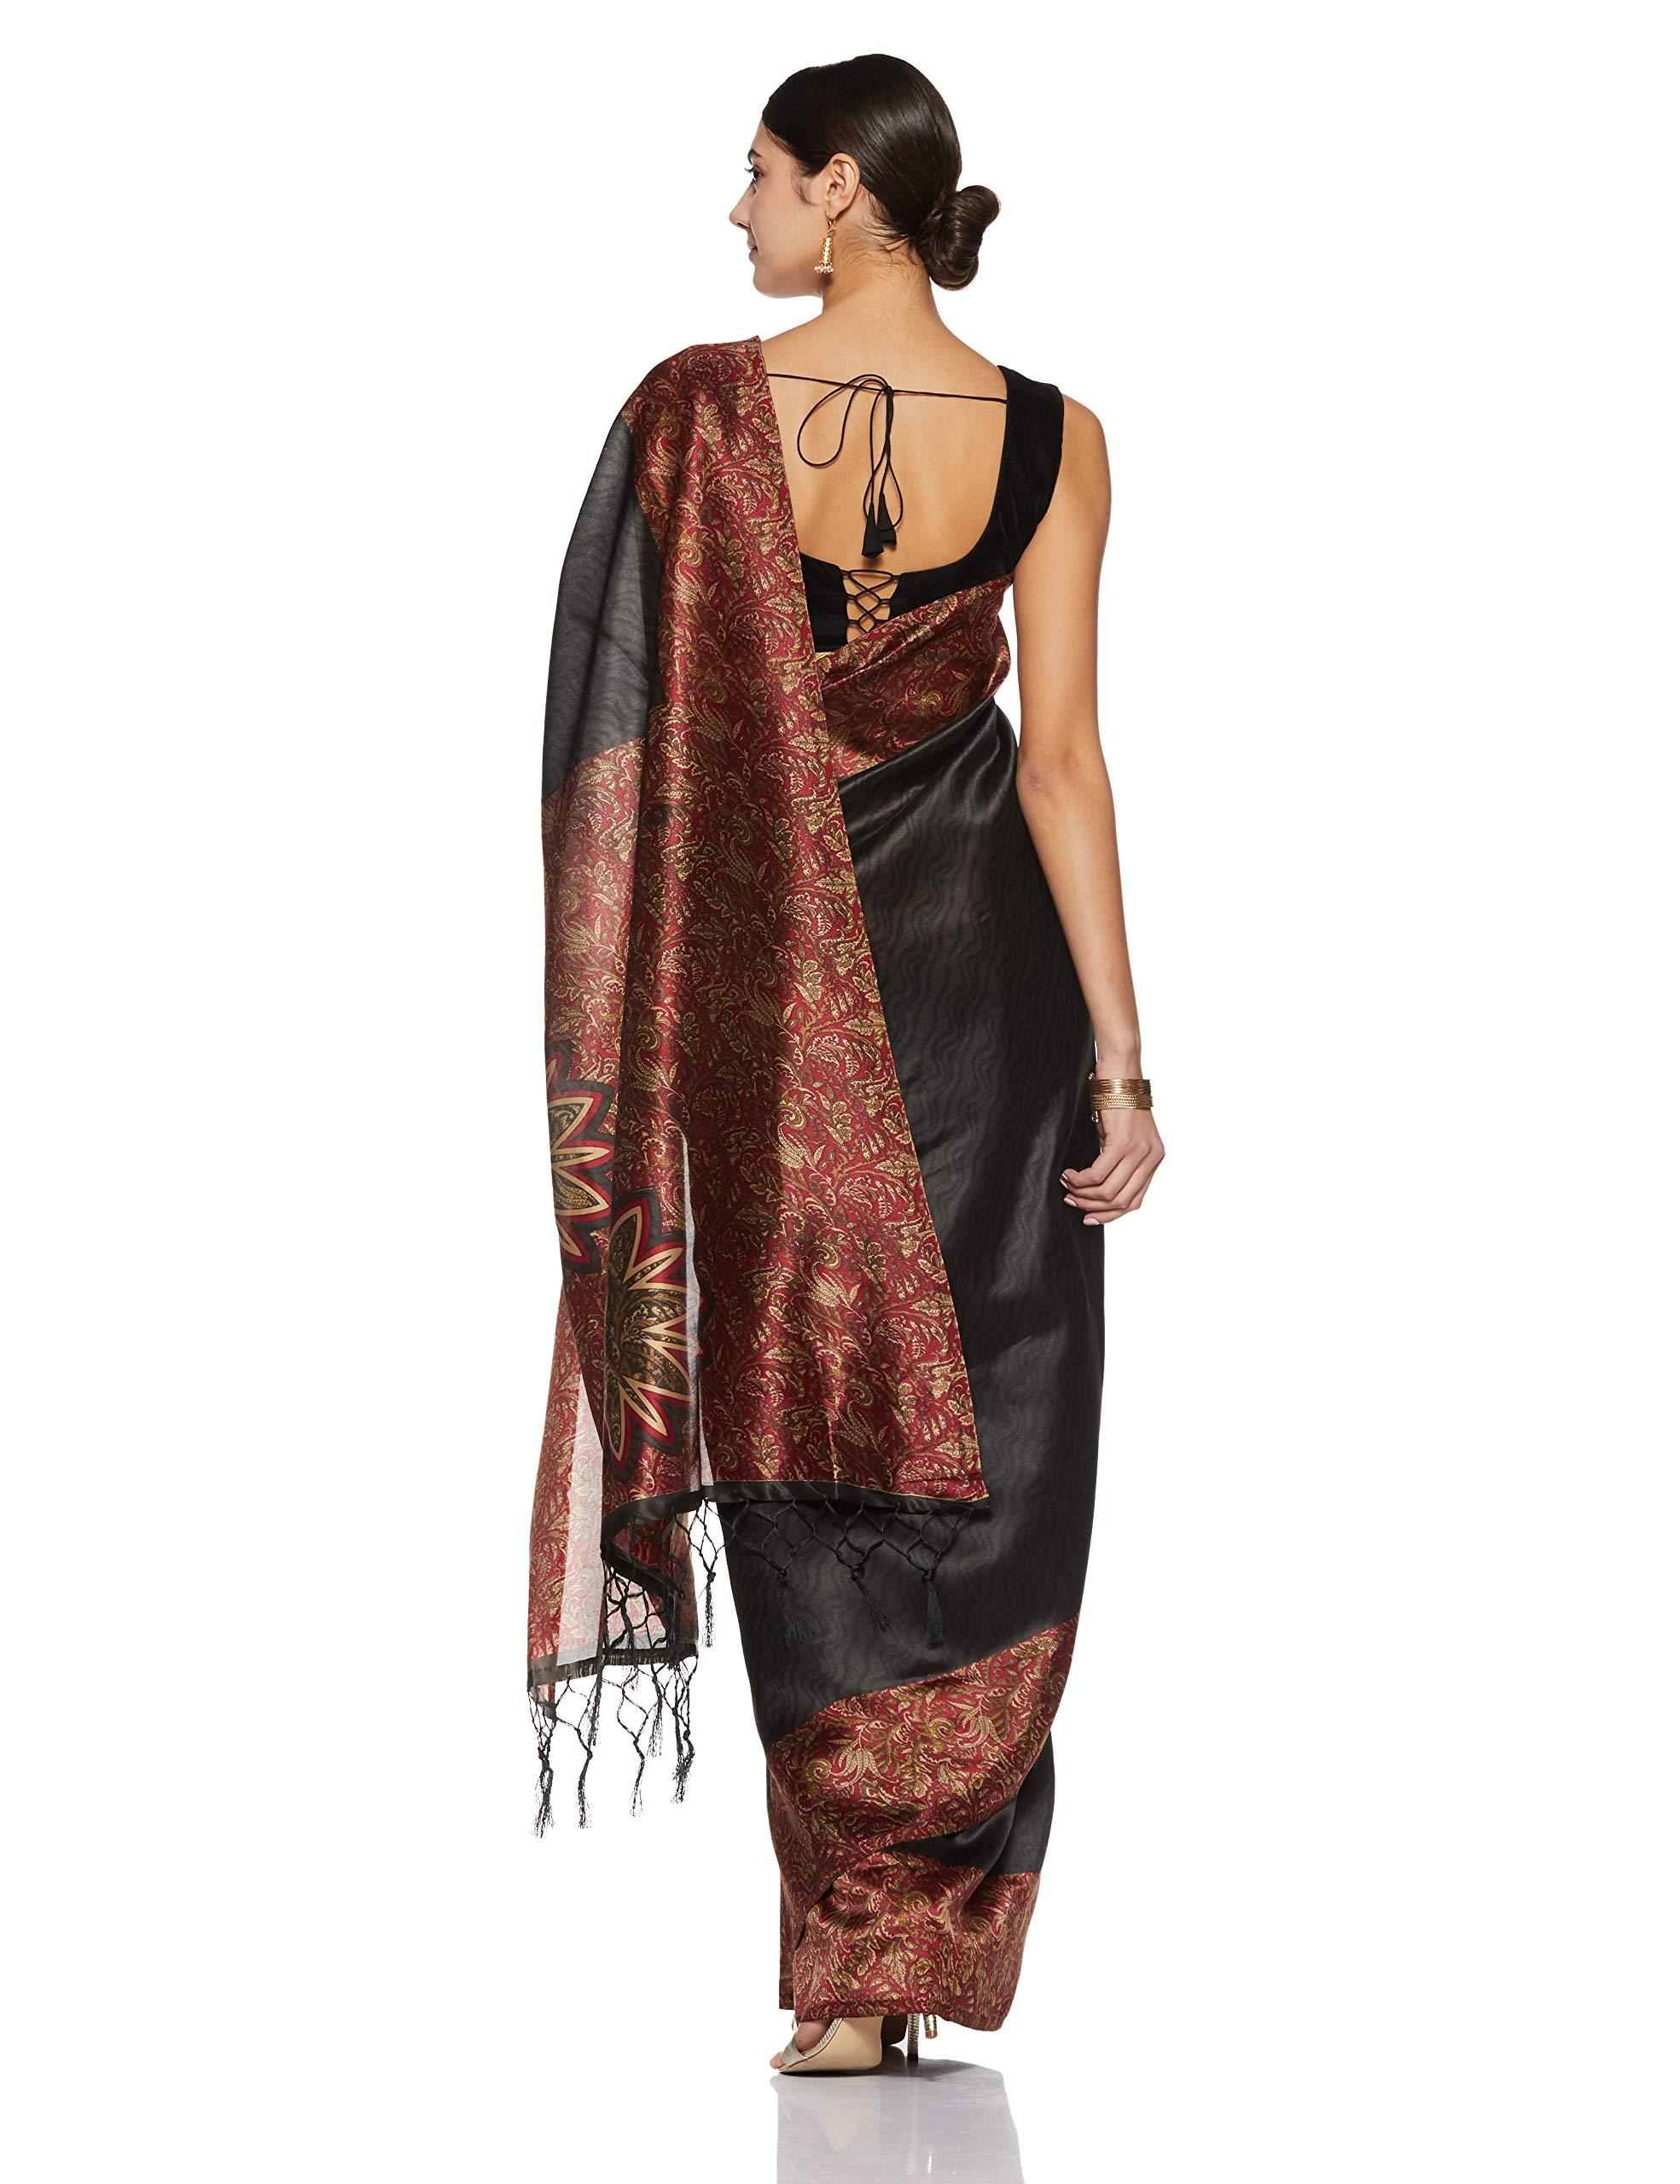 457754e1d Indira Designer Women s Art Mysore Silk Saree With Blouse Piece (Star-Red)  – Gryntha